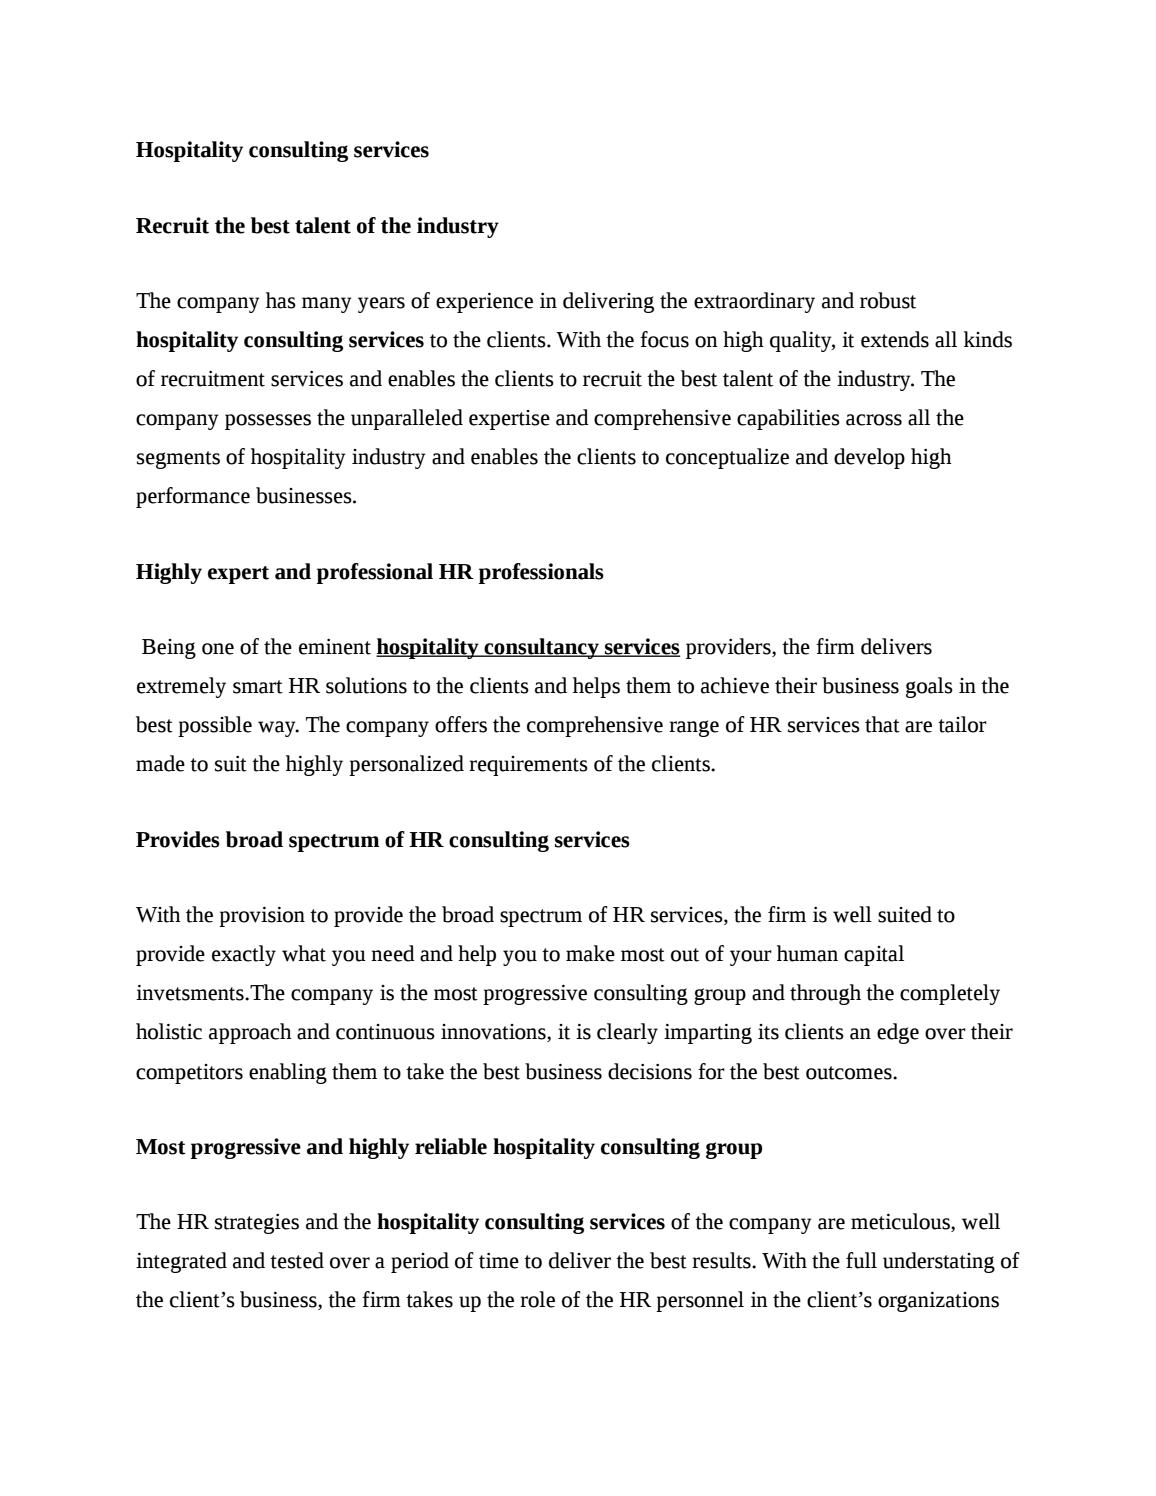 segments of hospitality industry